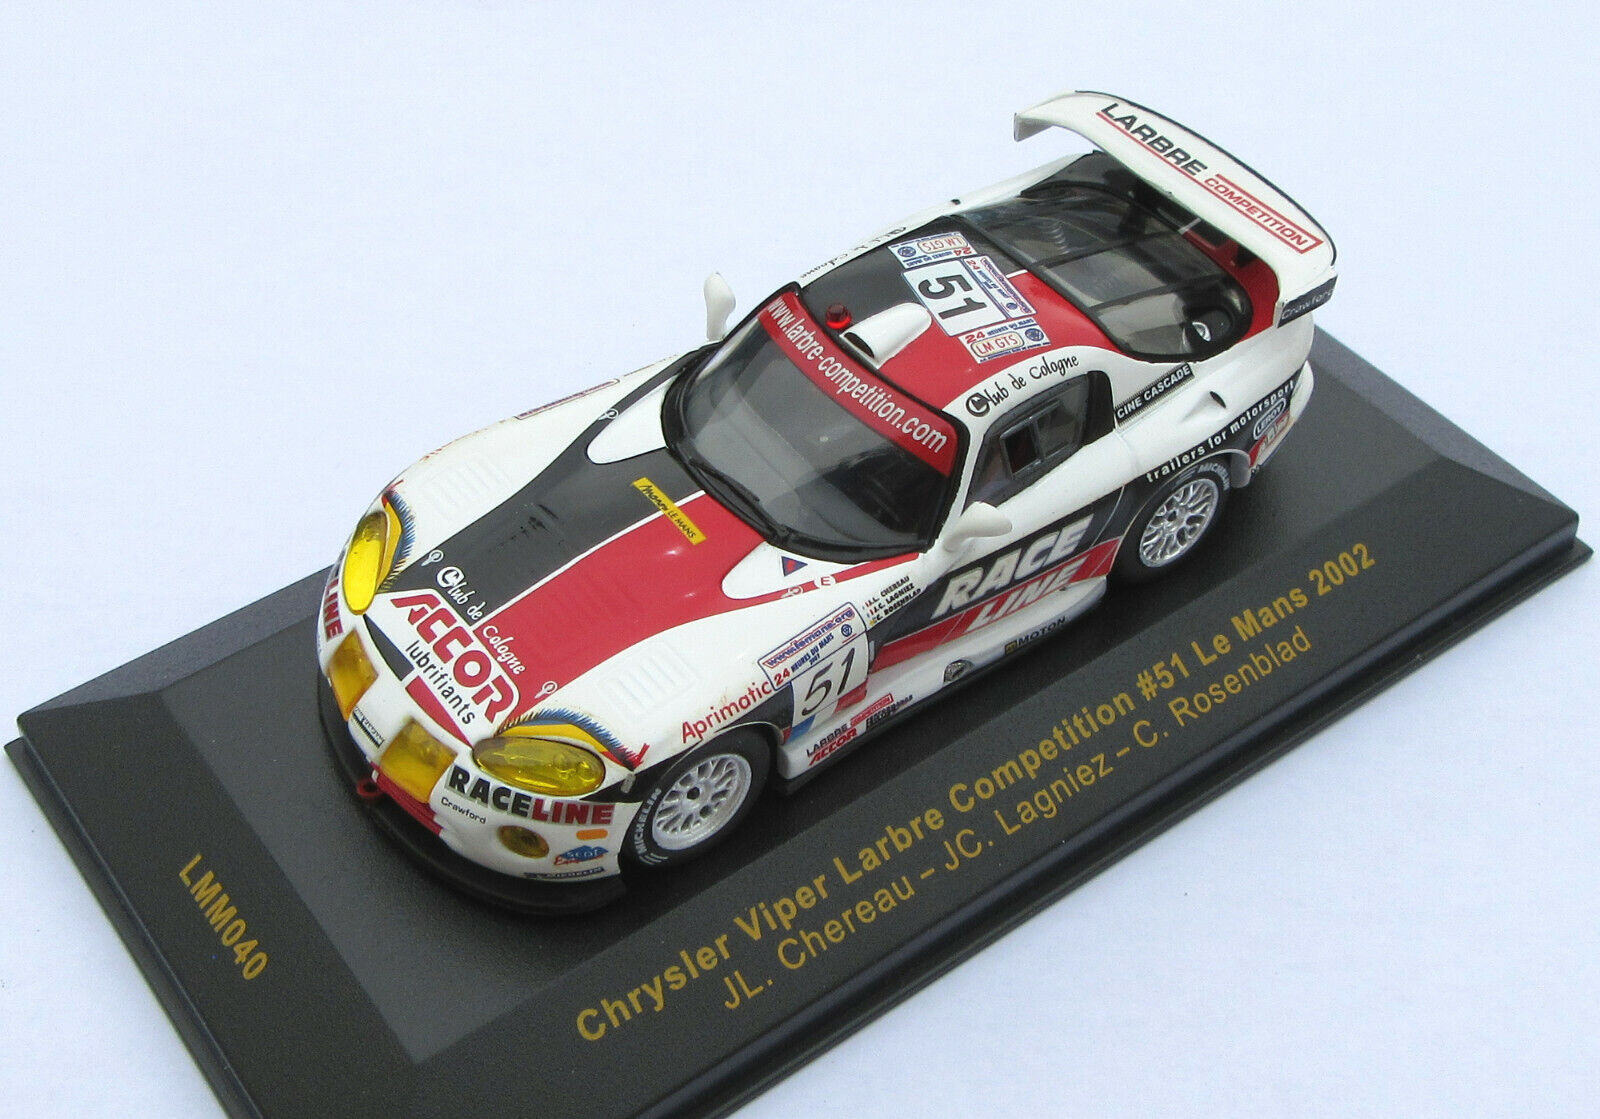 Chrysler Viper Larbre Competition n 65533;65533; 51 Le Mans 2002 - IXO 1  43